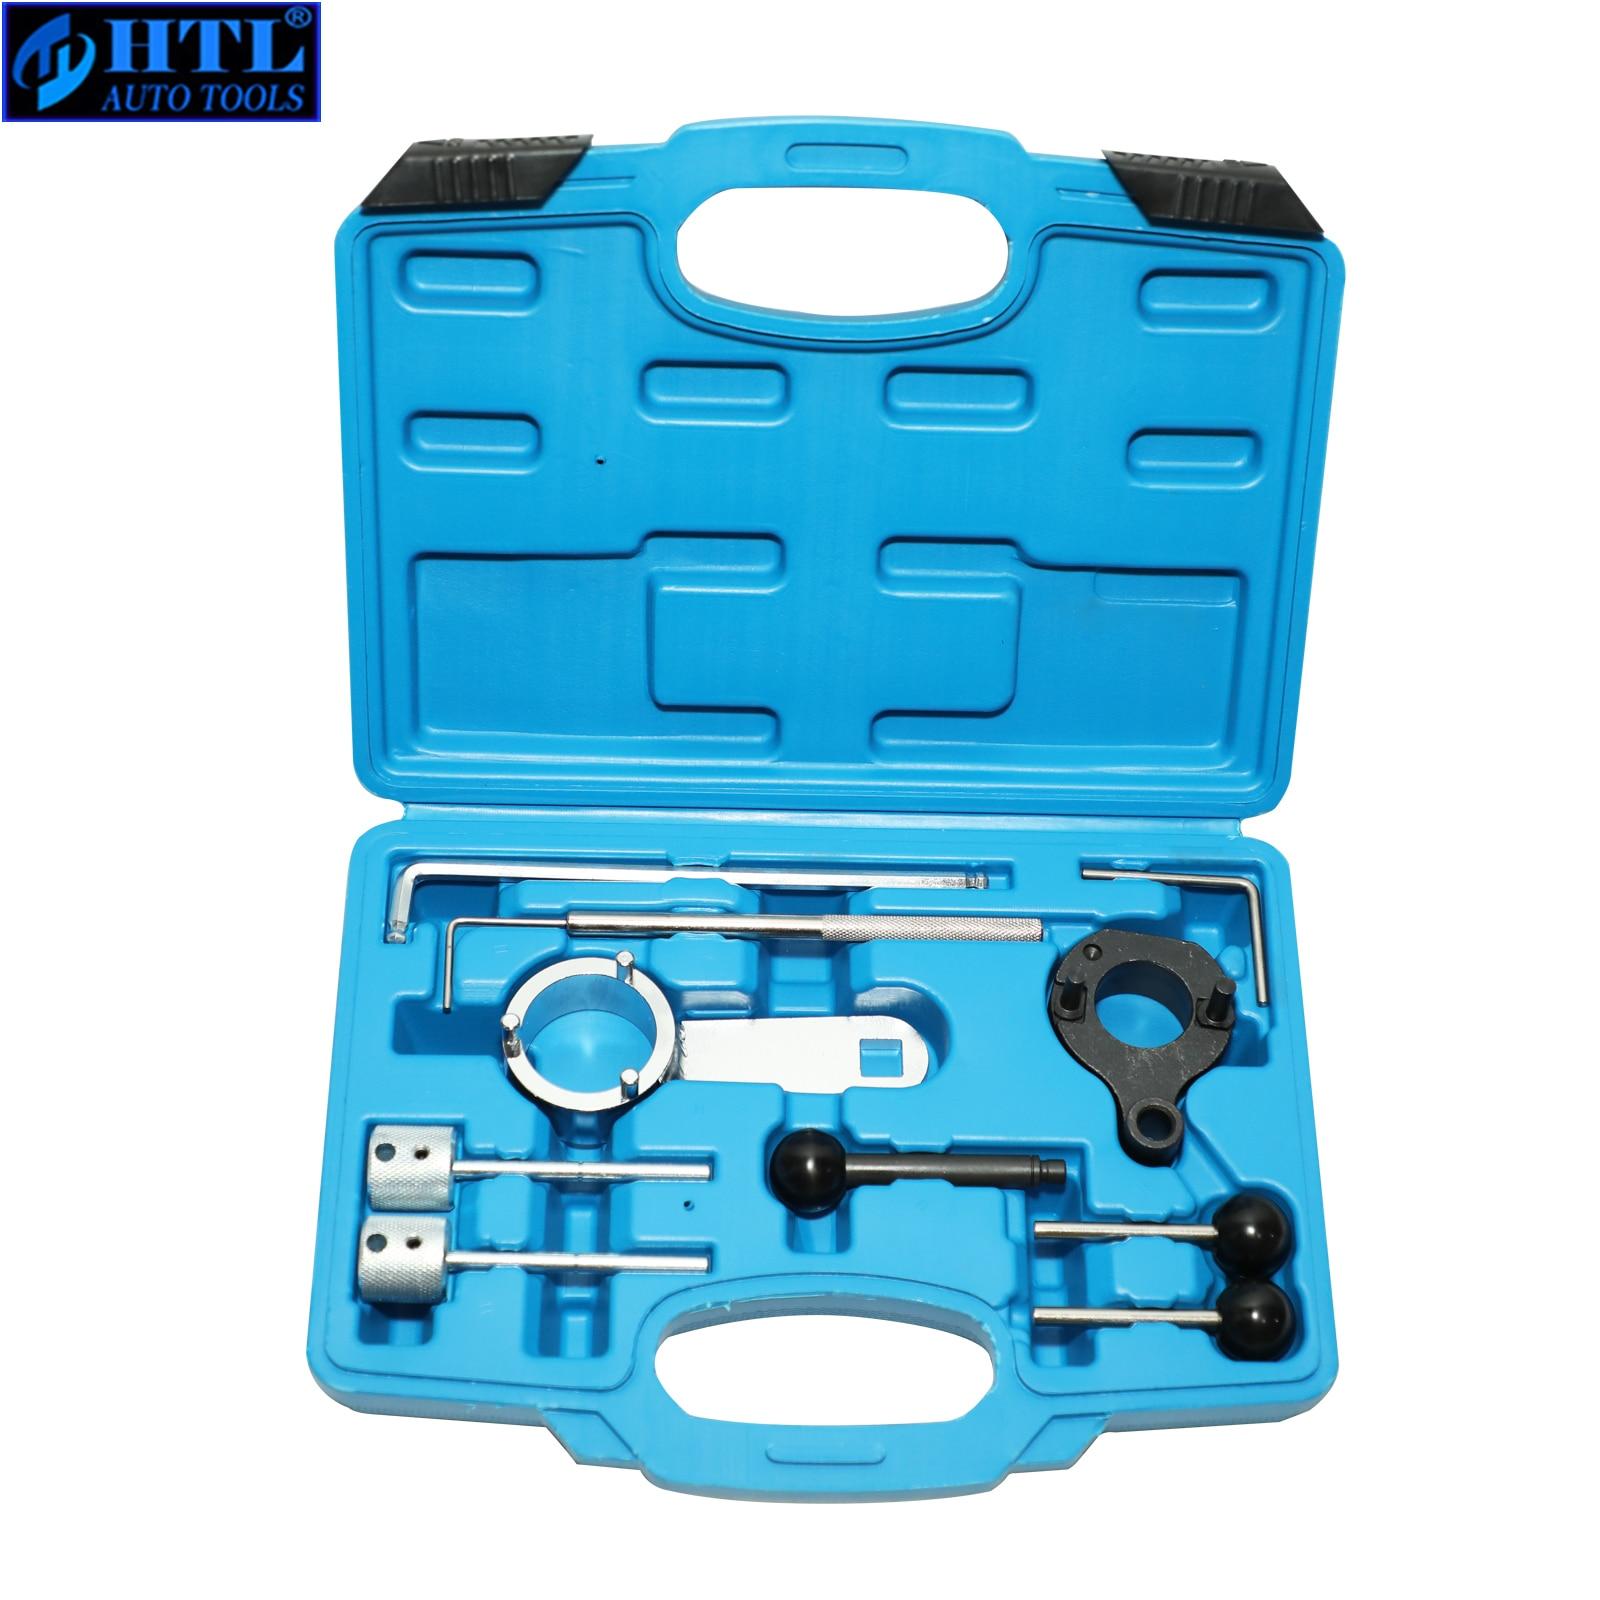 VAG Engine Timing Locking Tool Kit  For VW AUDI SEAT SKODA DIESEL ENGINE 1.6/2.0 TDI CR  VA engine diesel injector puller set removal garage tool for vag tdi vw audi